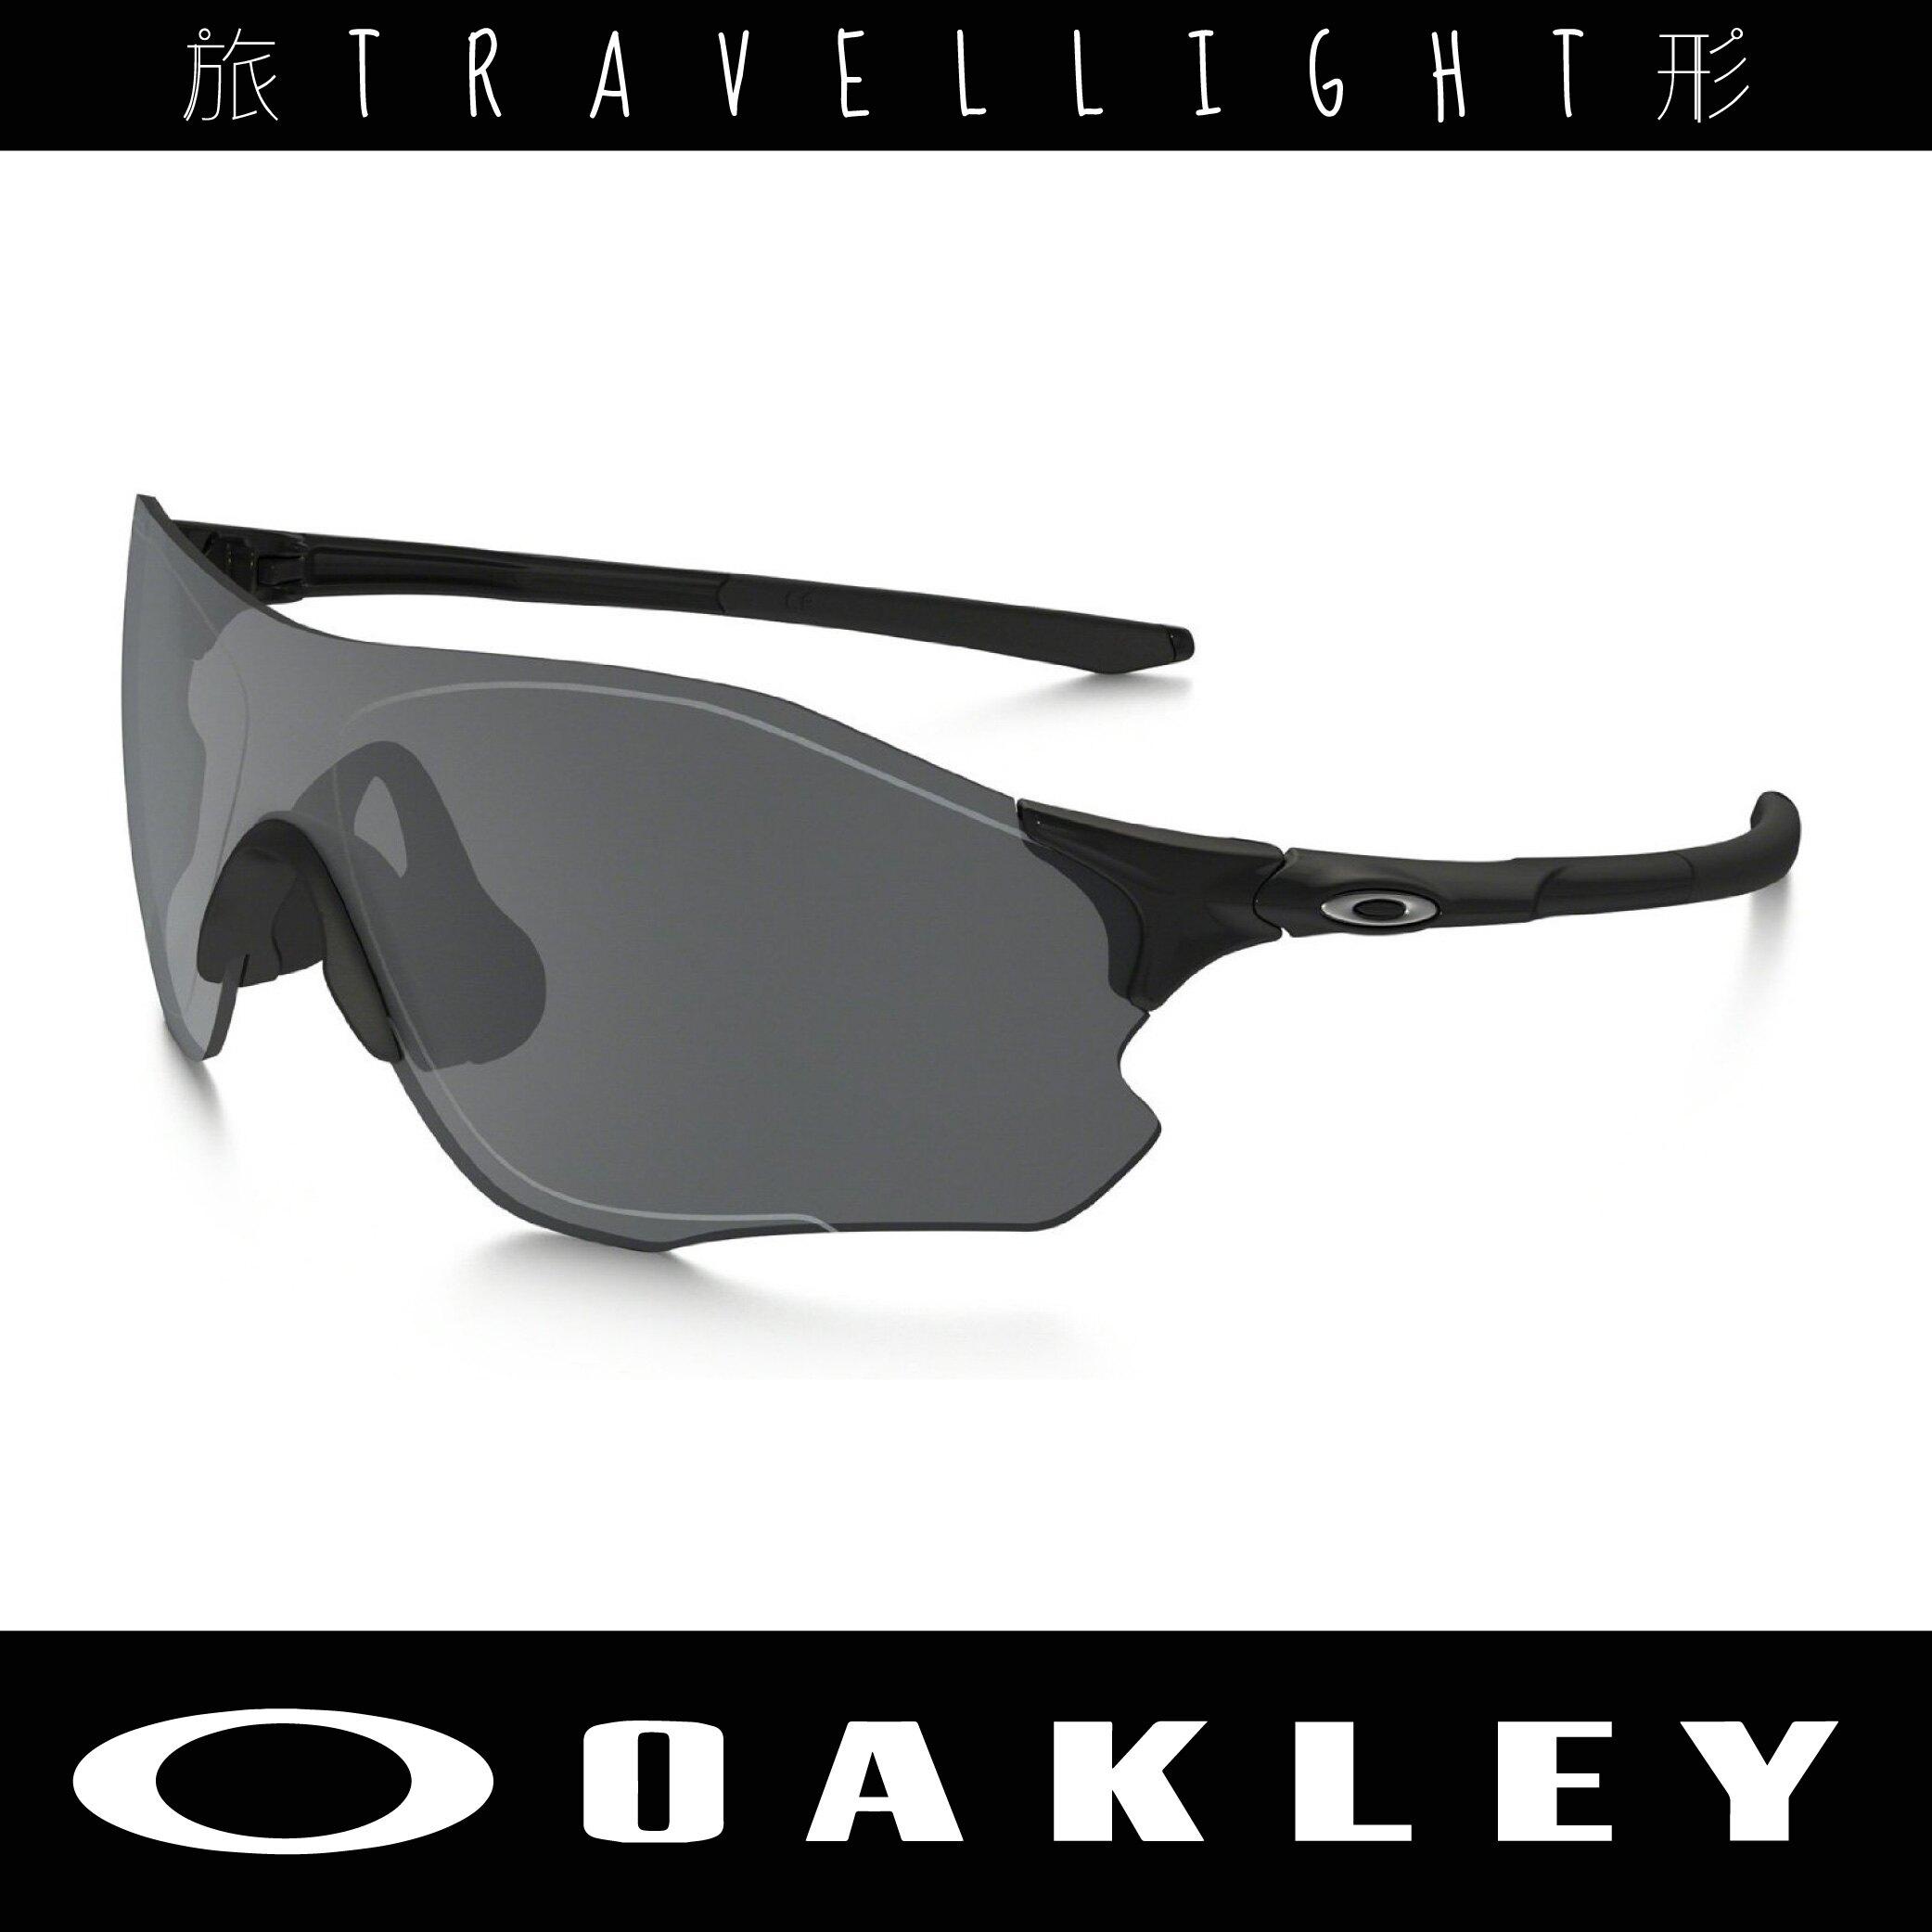 【Oakley】太陽眼鏡 運動基本款 EVZero™ Path Black 9313-01 Travellight旅形。人氣店家Travellight 旅形的OAKLEY 美國、太陽眼鏡有最棒的商品。